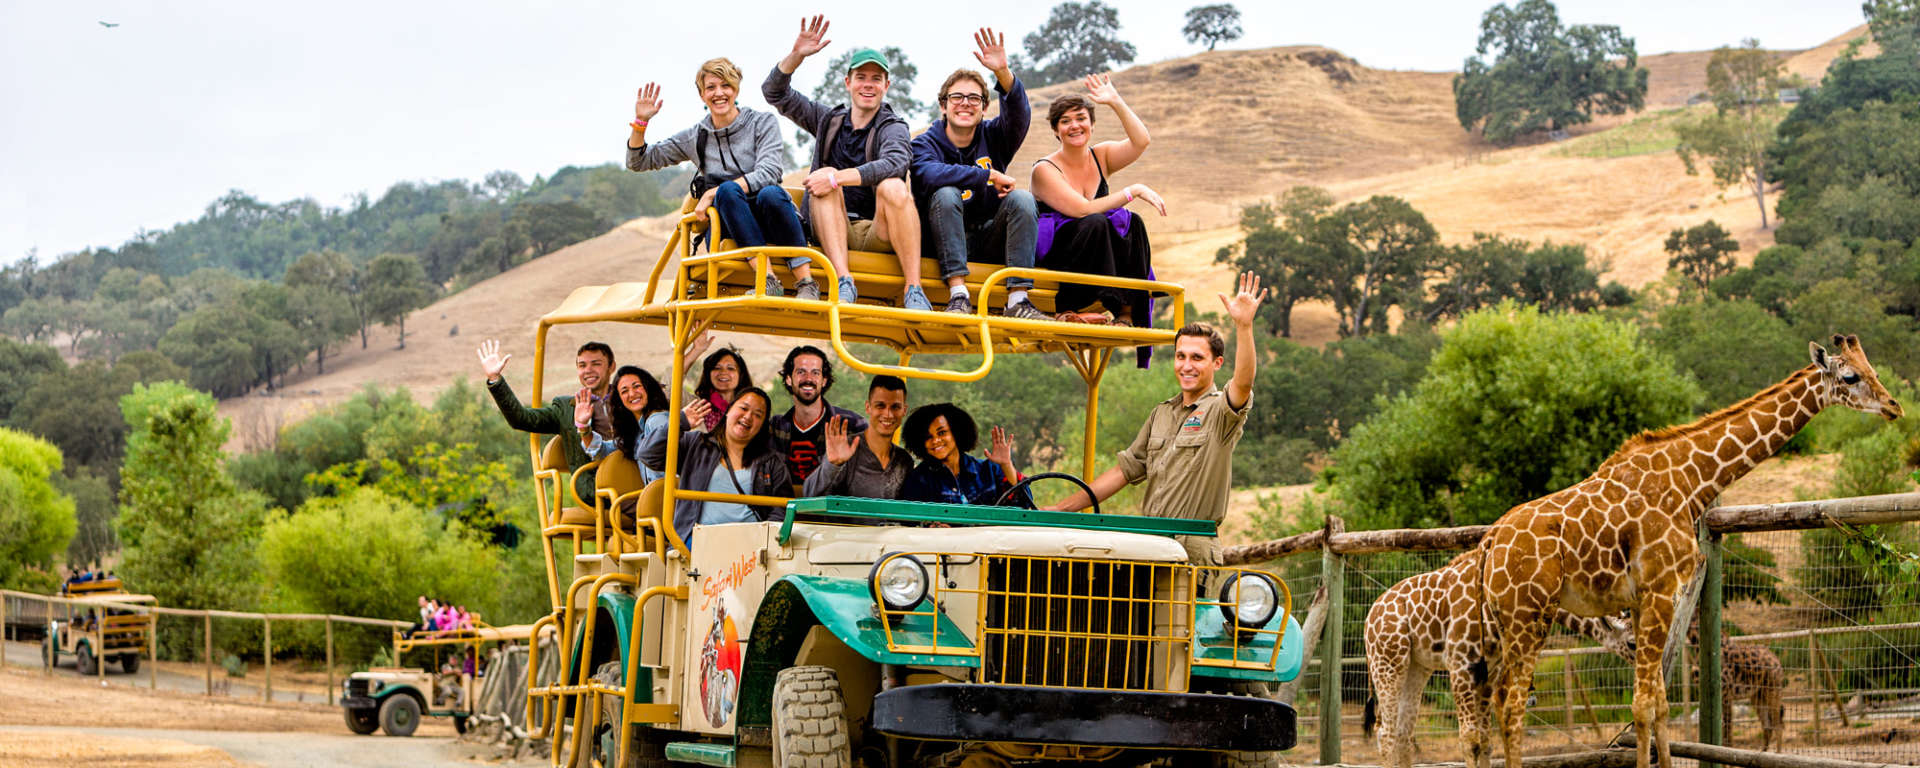 Safari Adventure by Ray Mabry